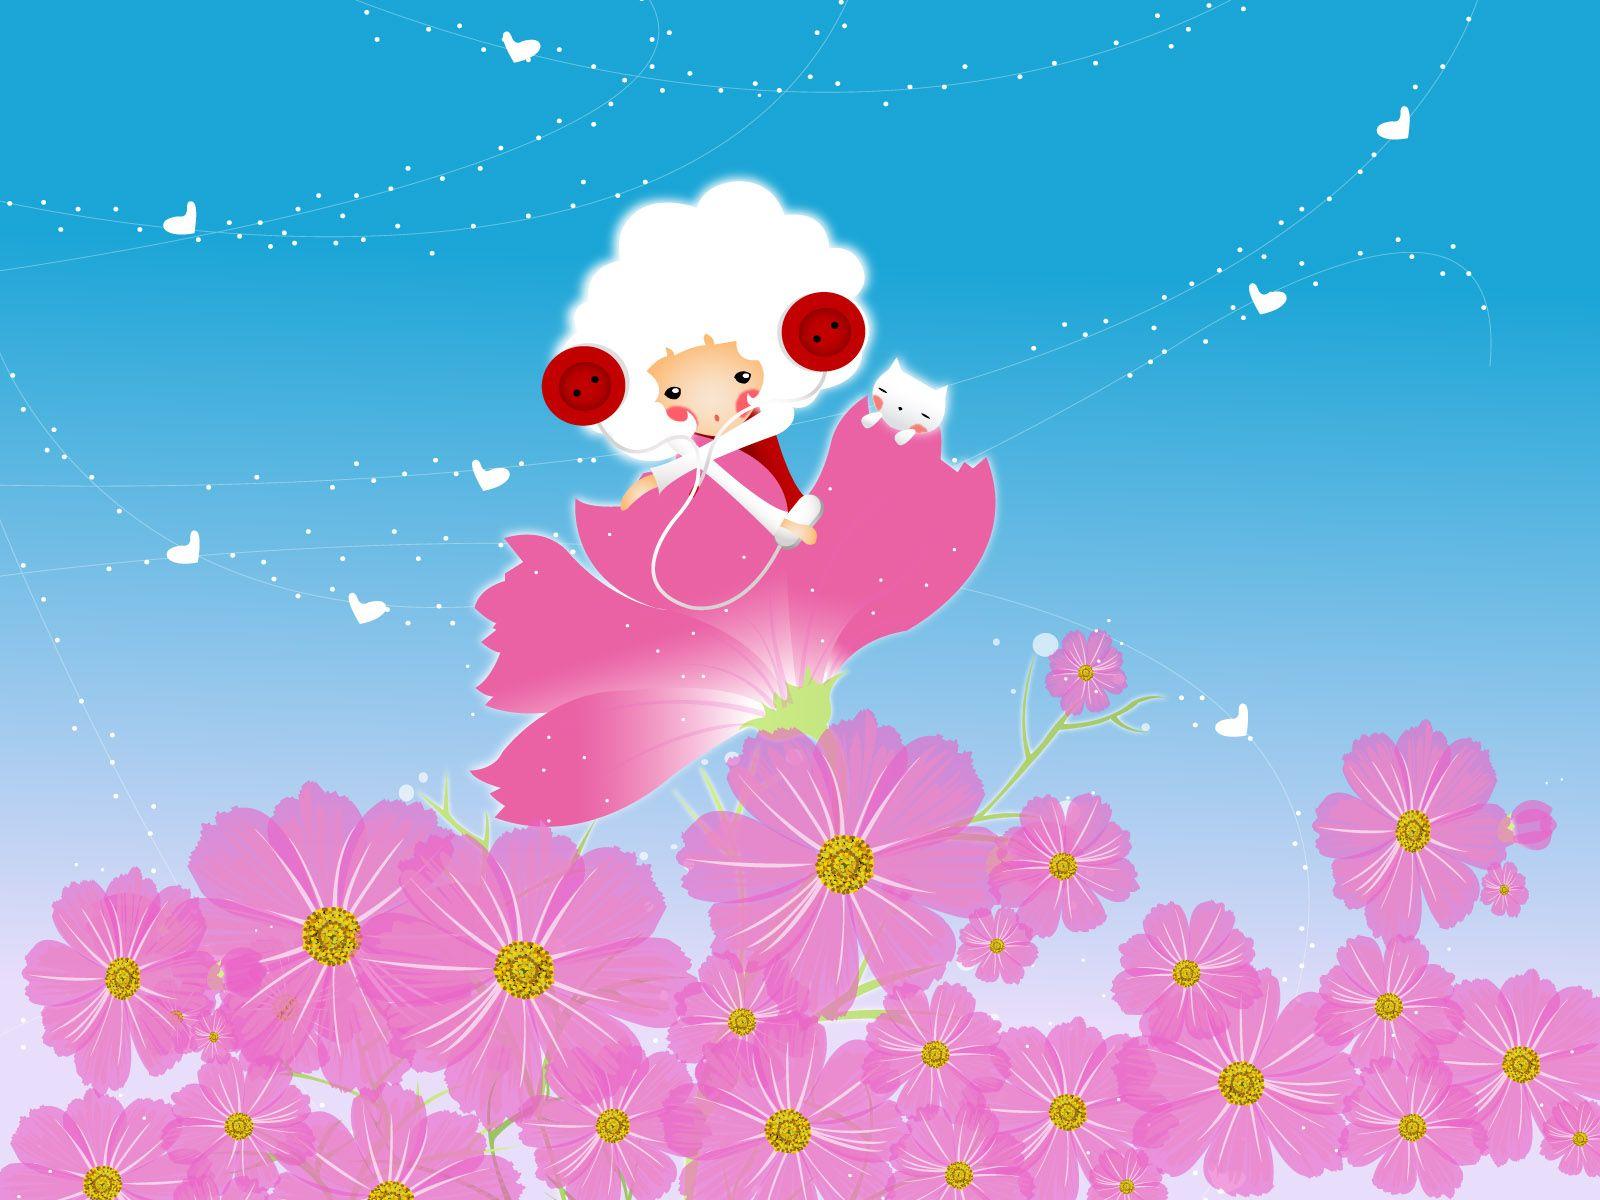 Spring HD Desktop Wallpaper   Spring desktop Wallpapers - Barbaras HD Wallpapers #springdesktopwallpaper